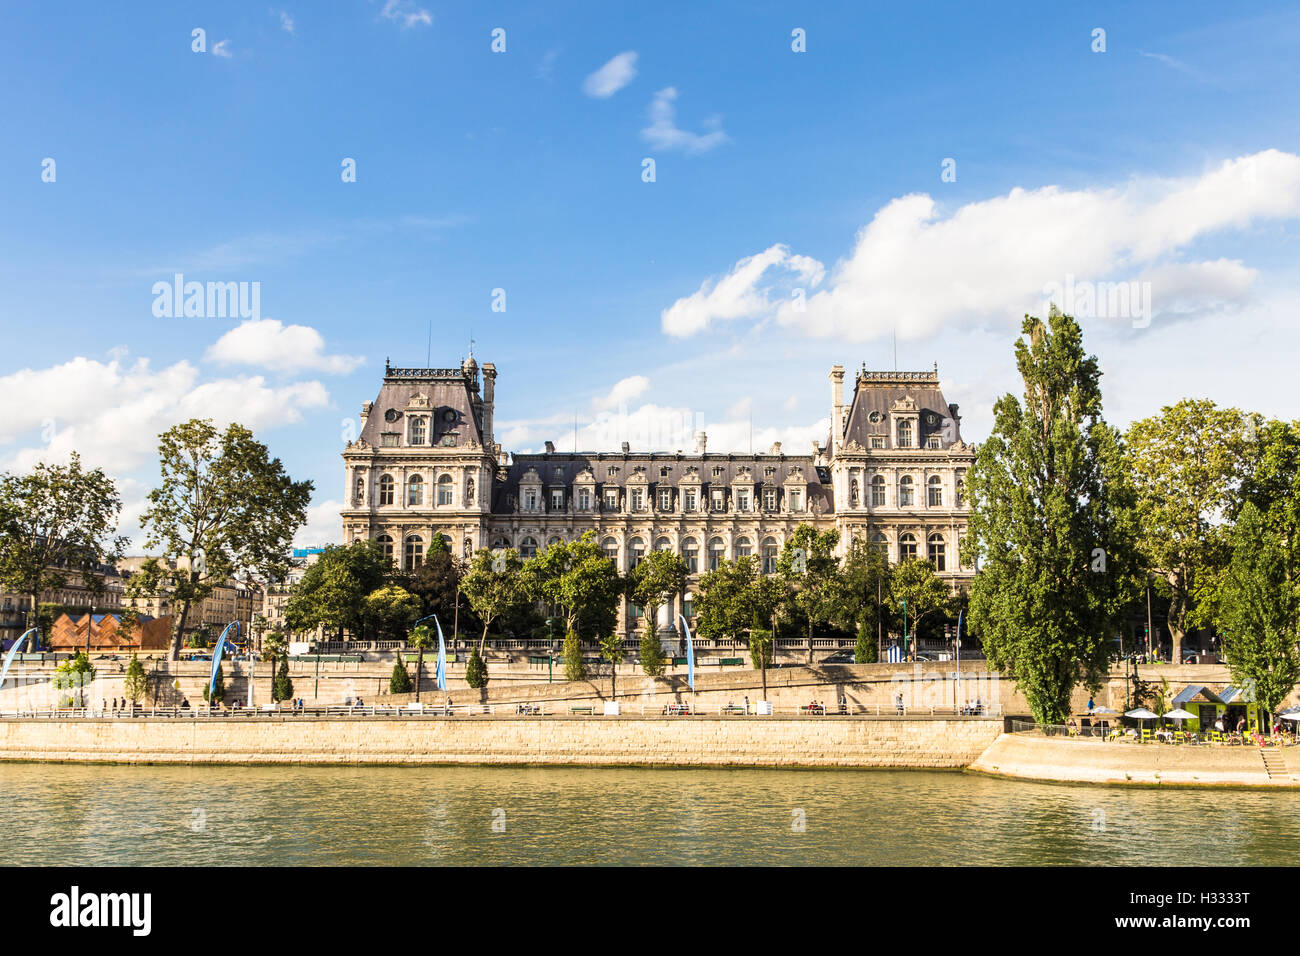 The facade of Paris city hall (hotel de ville) along the Seine river in Paris, France capital city. - Stock Image